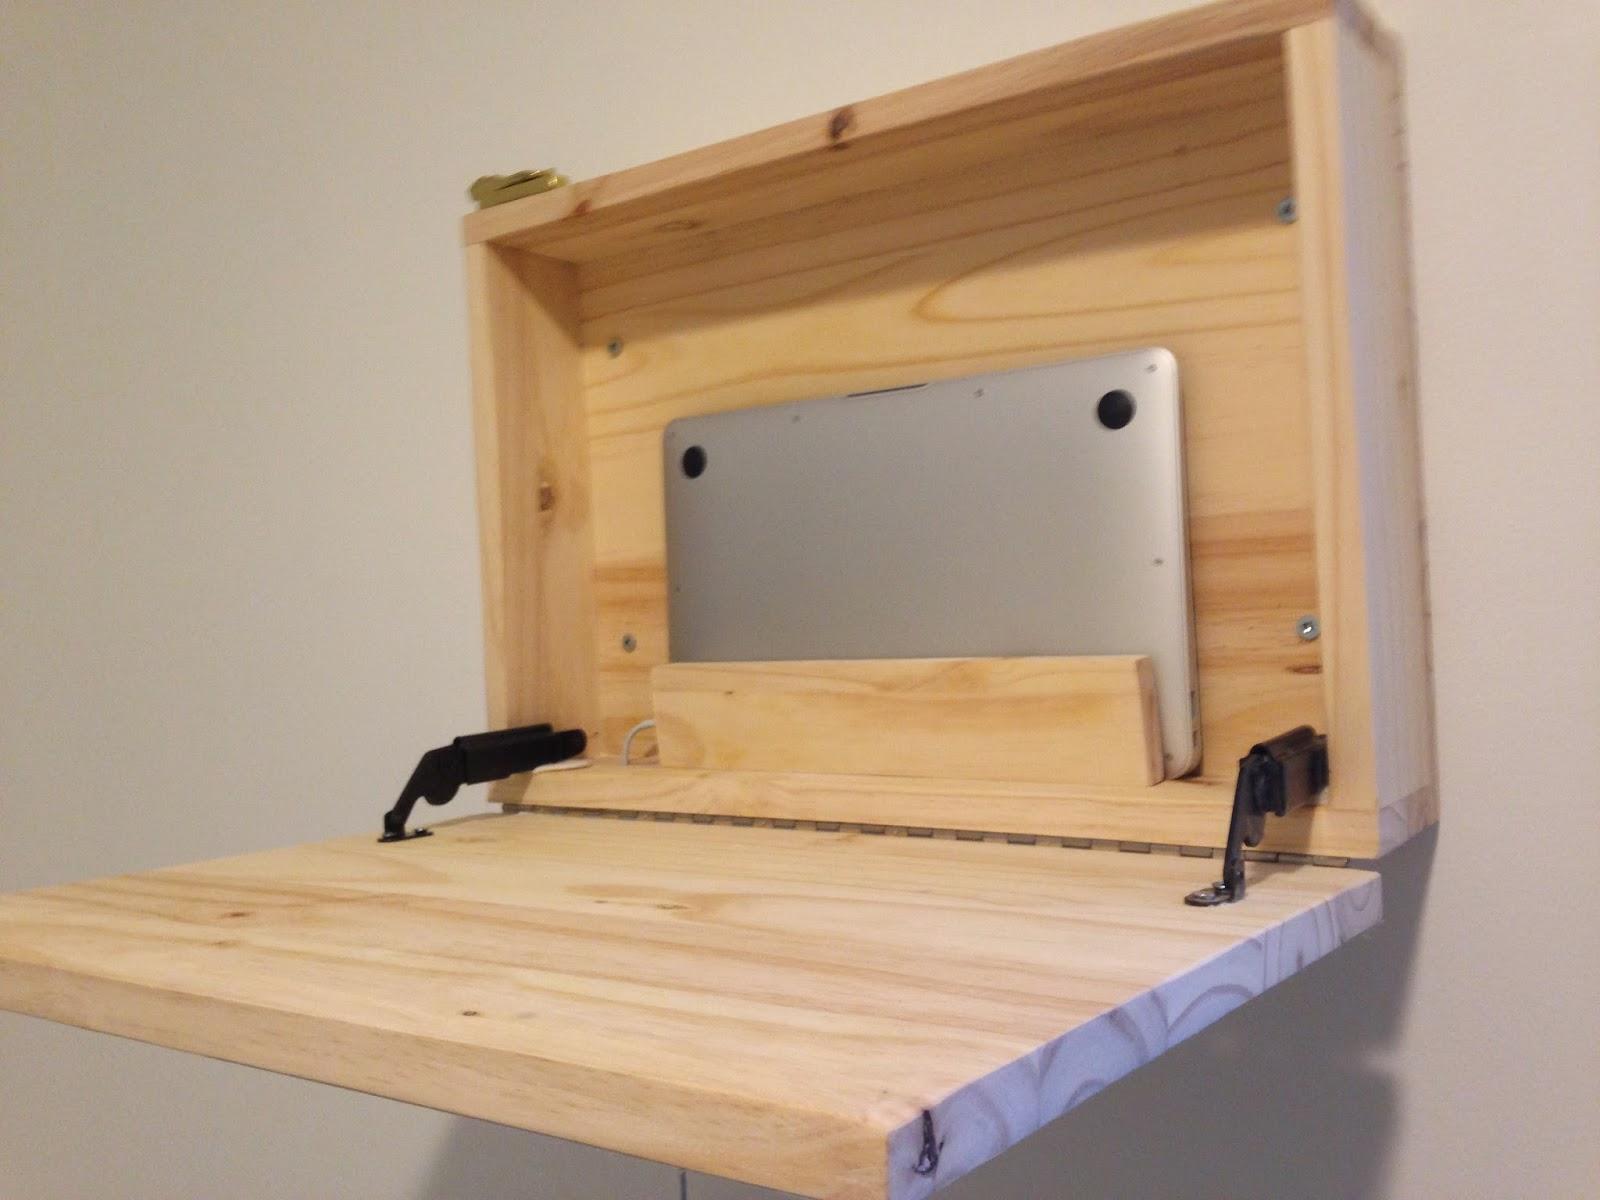 Bigge Idea: A cheap and attractive DIY standing desk option